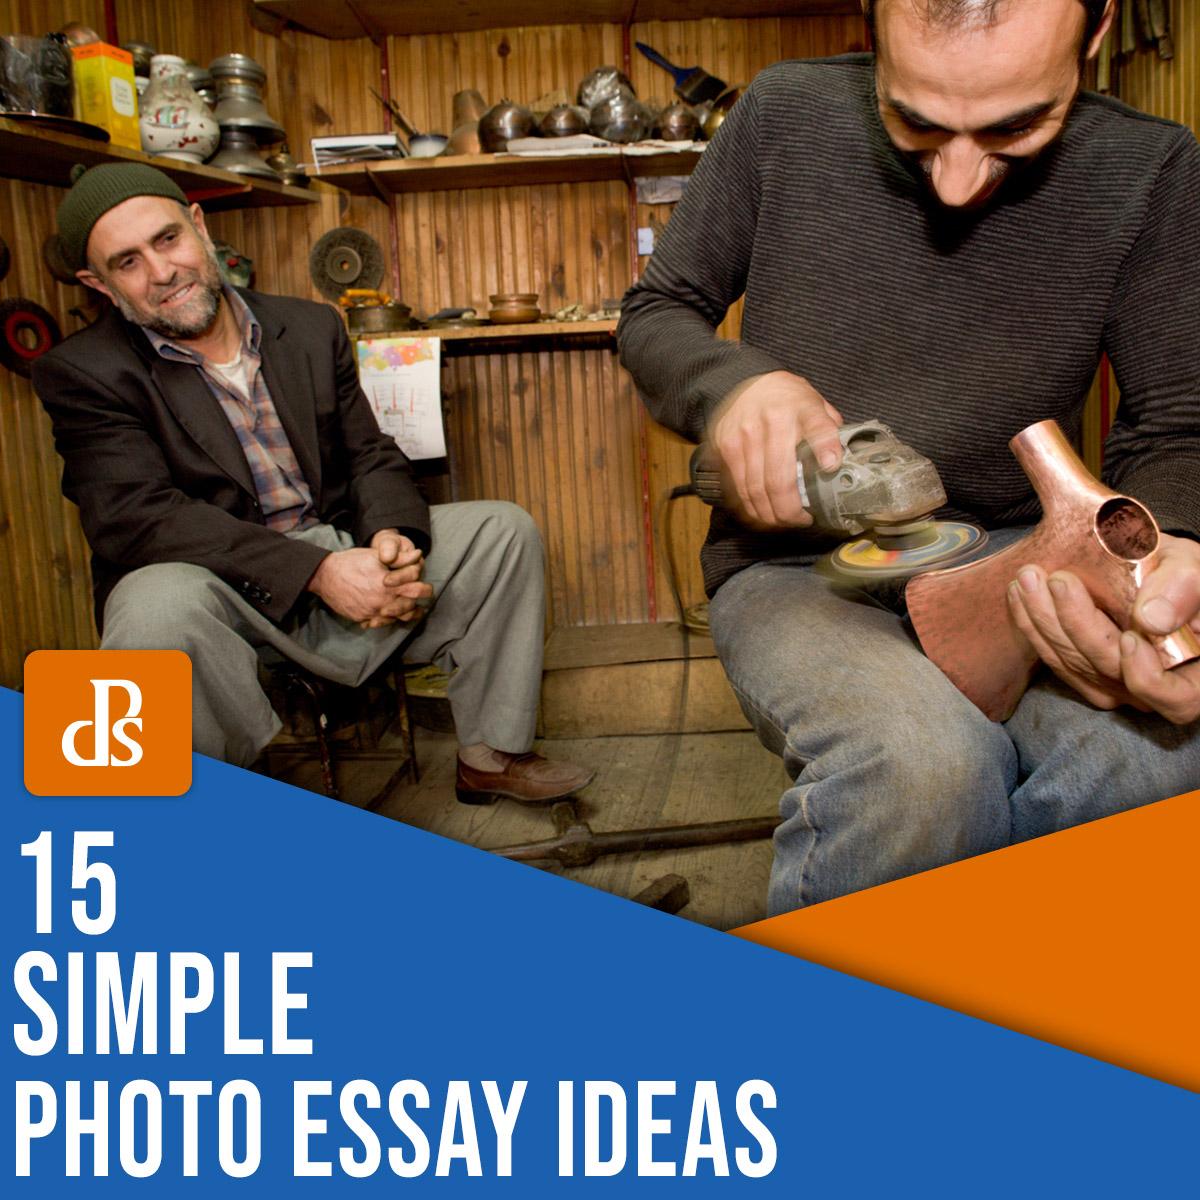 photo essay ideas